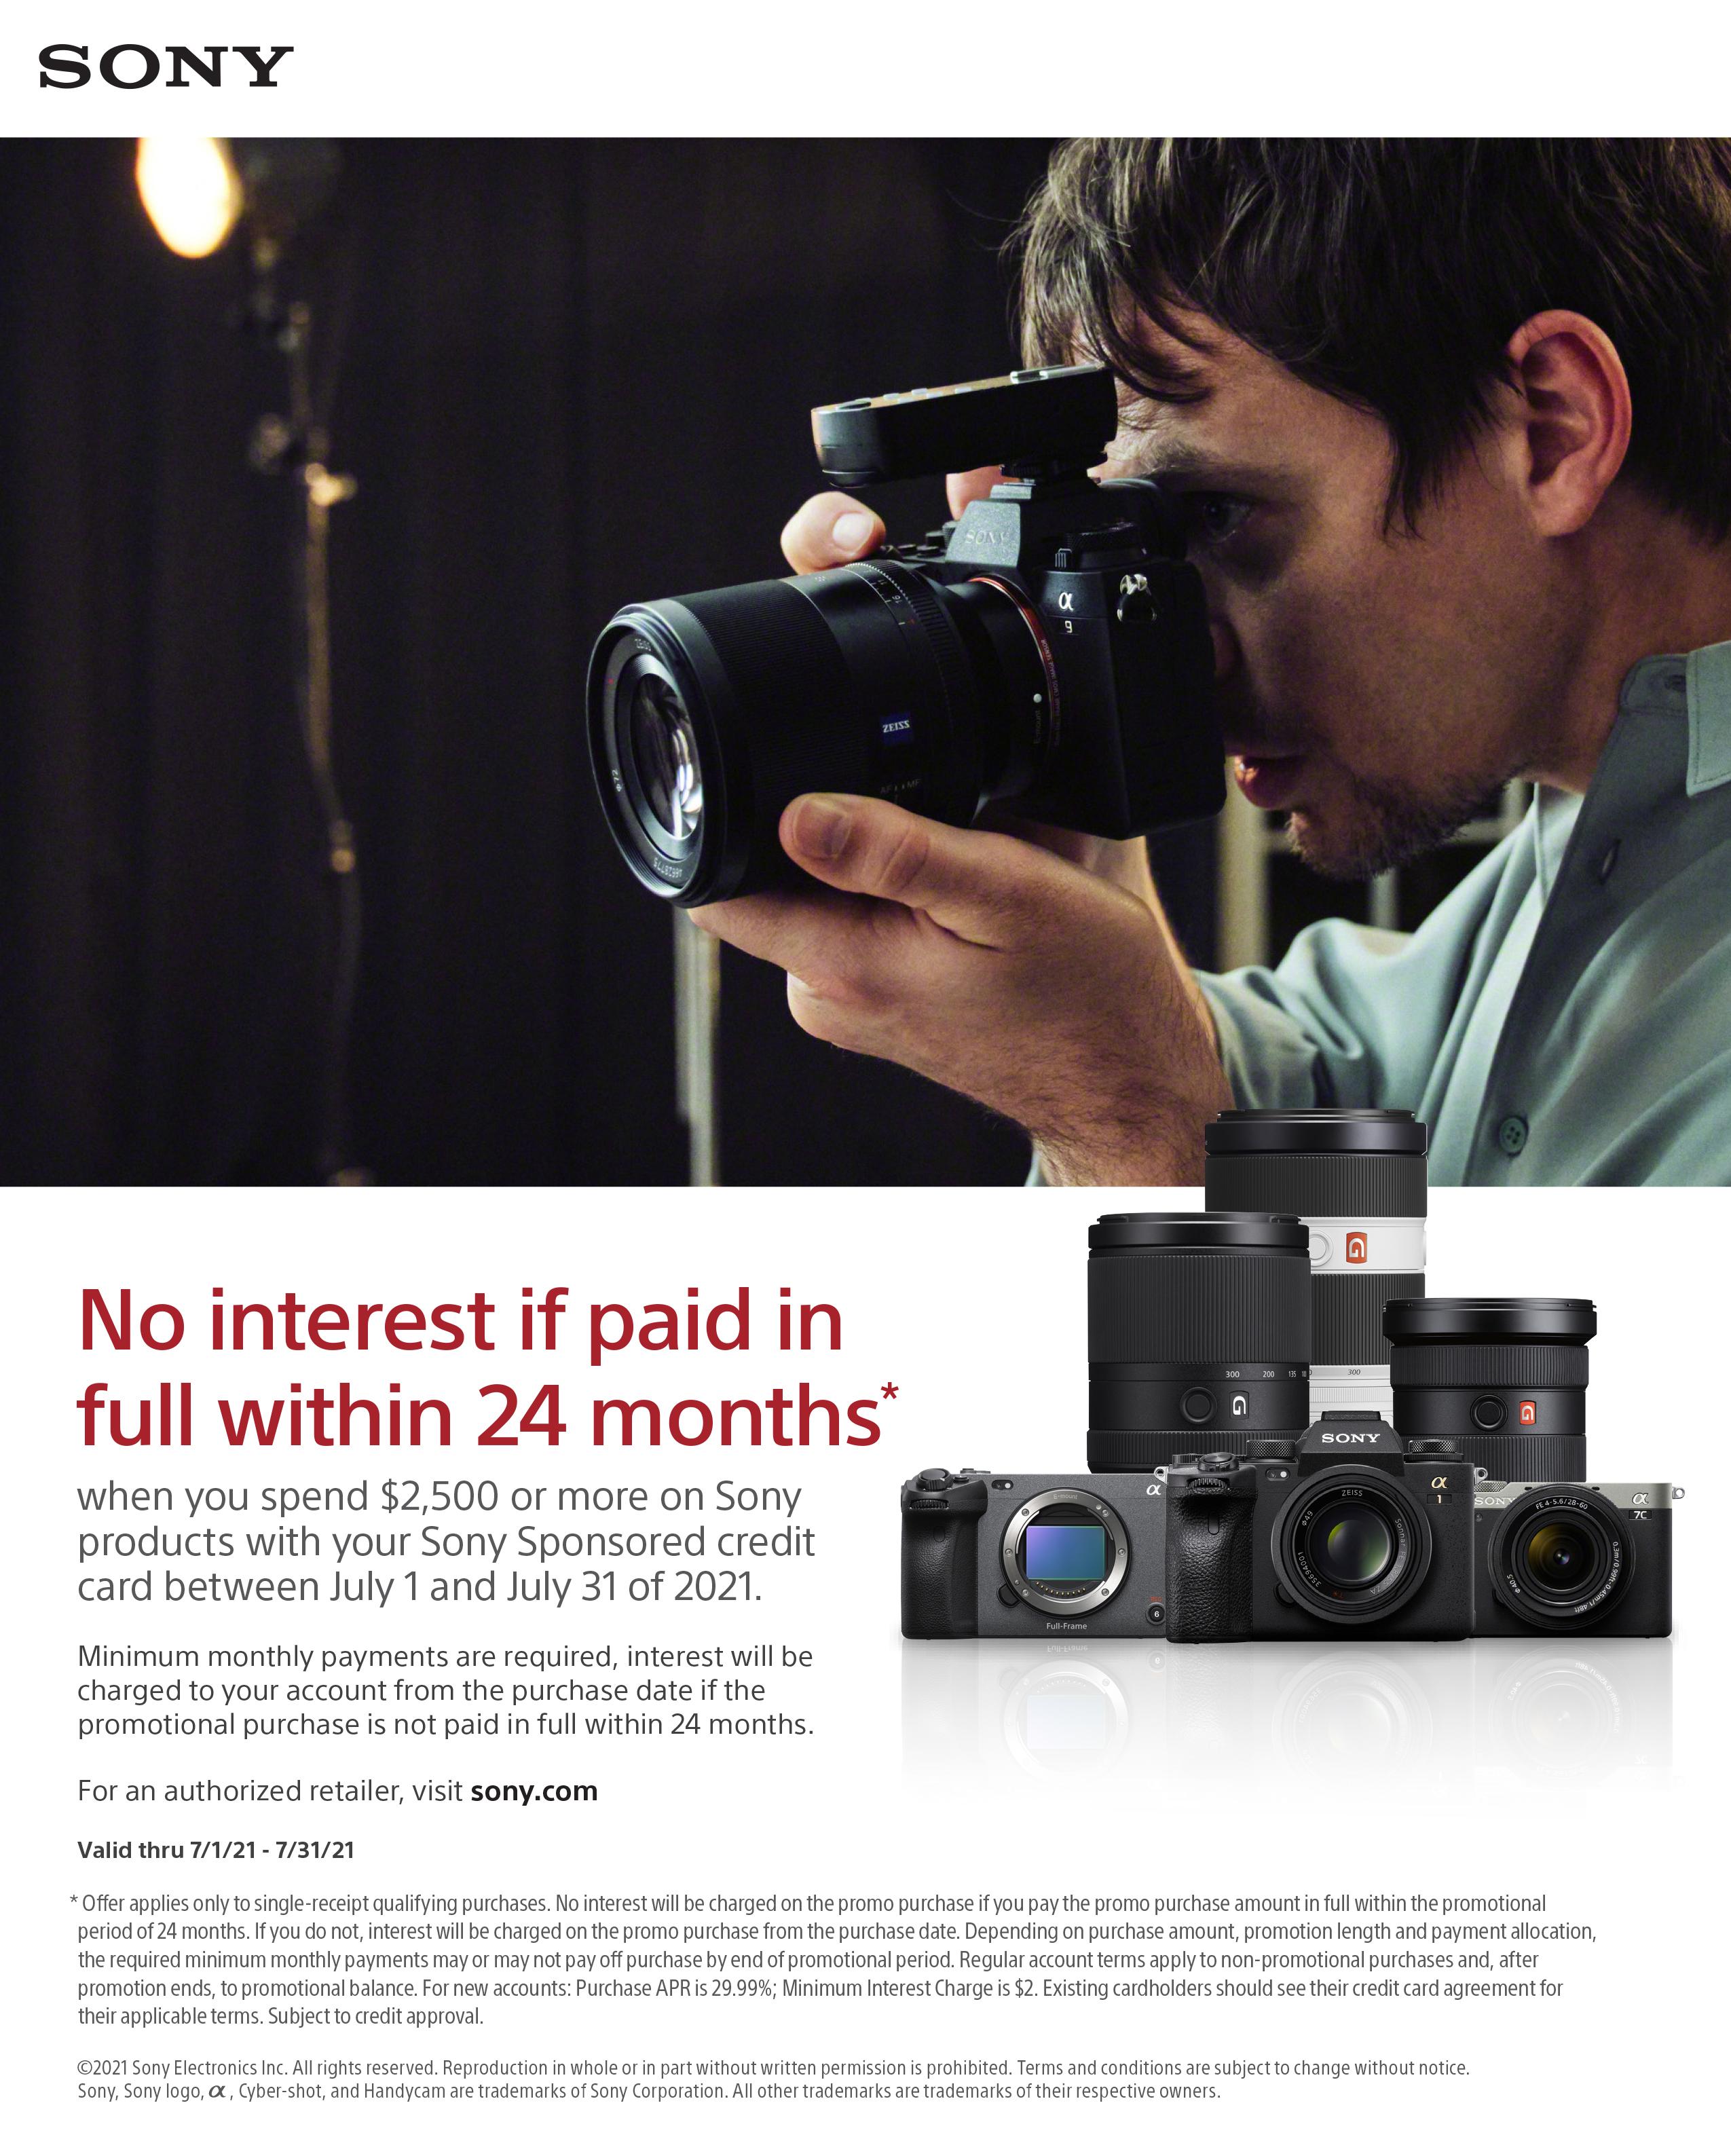 sonysponsoredfinancing-summer20201-customer-1-2.jpg